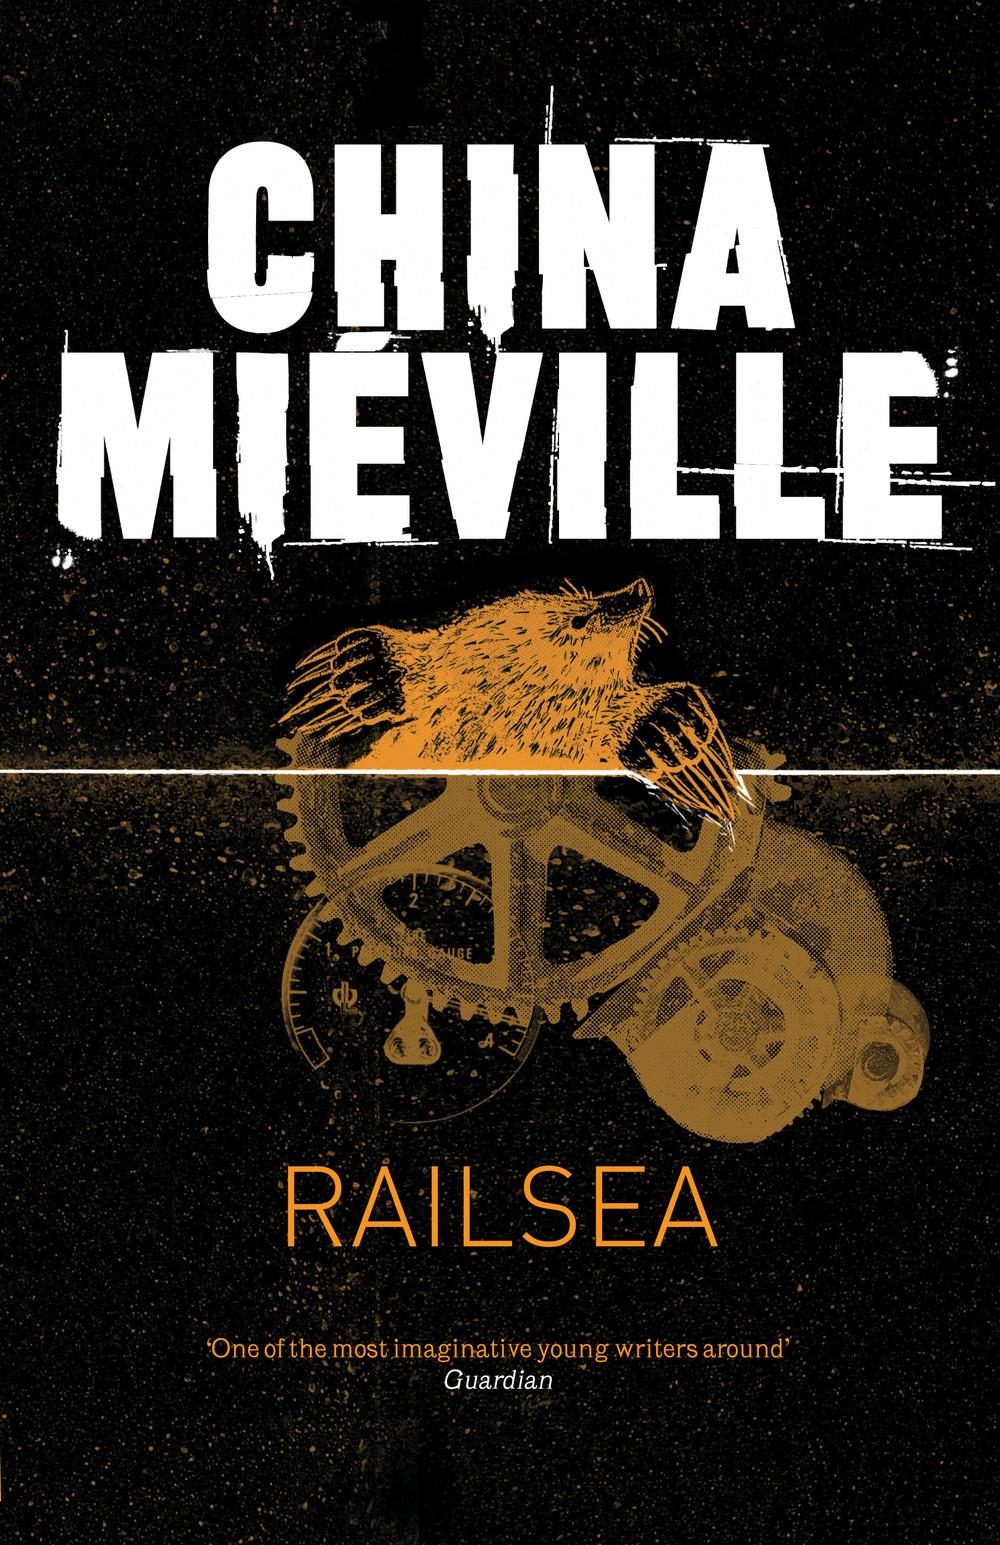 railsea rhb mieville